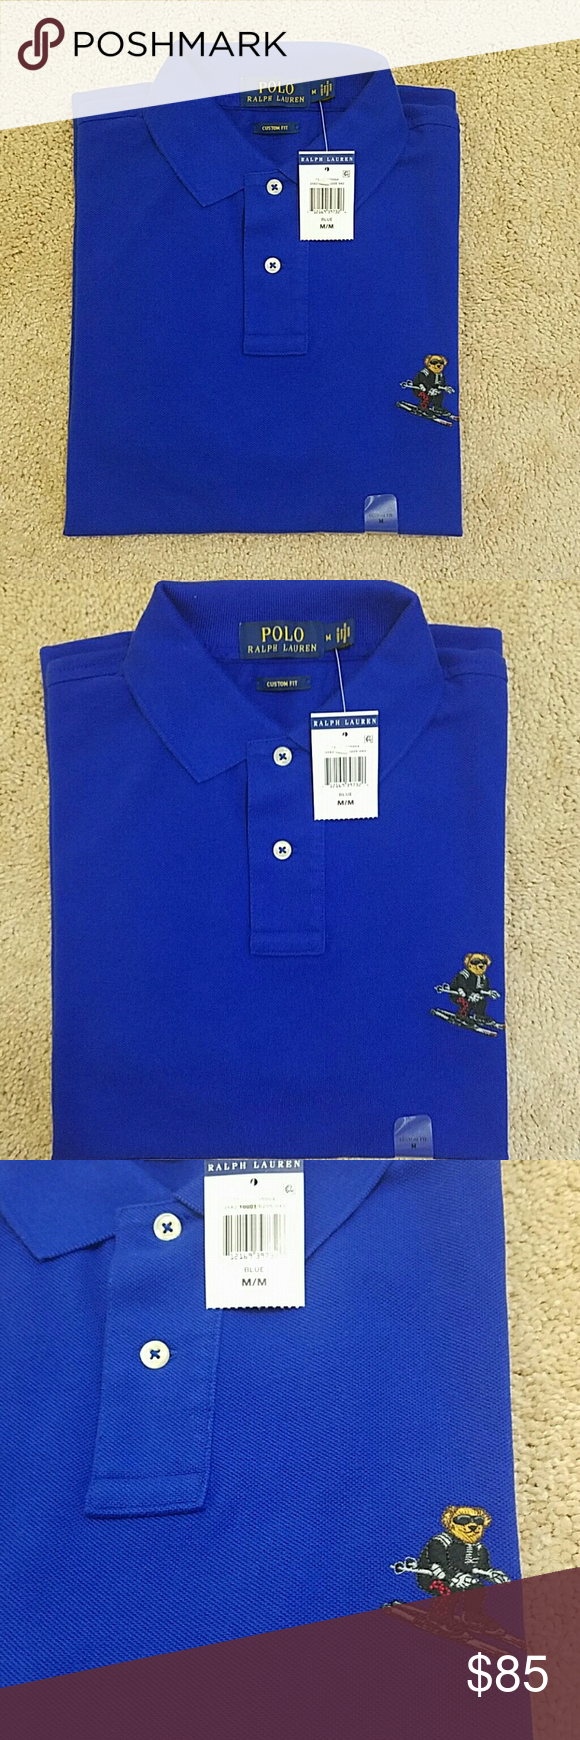 Ralph Fit Polo Royal Bear Men's Lauren Custom Blue c3qjRL4S5A